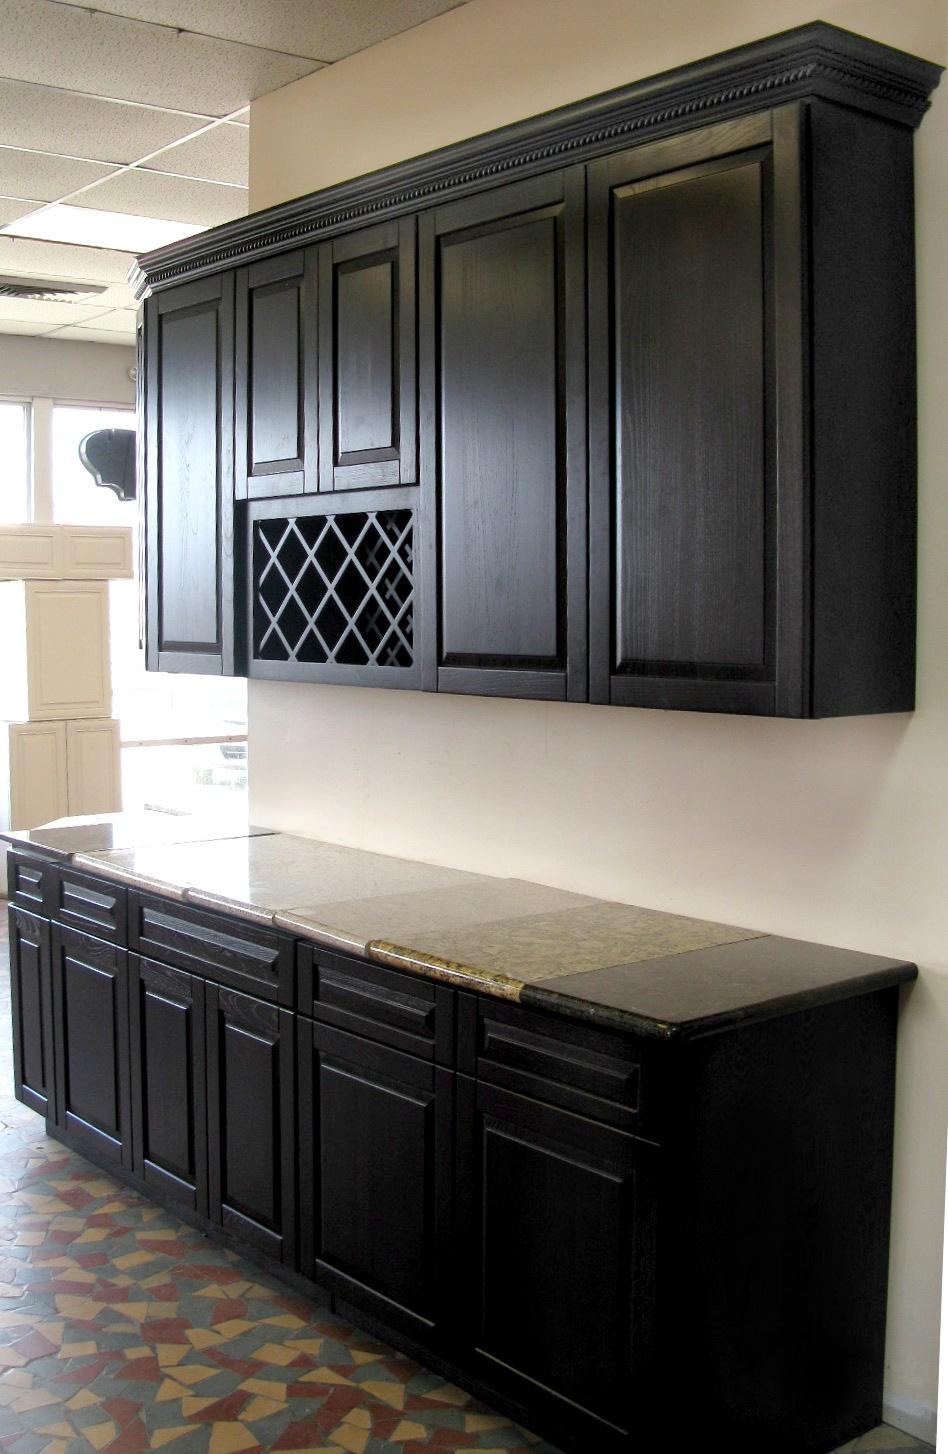 black kitchen cabinets images photo - 9